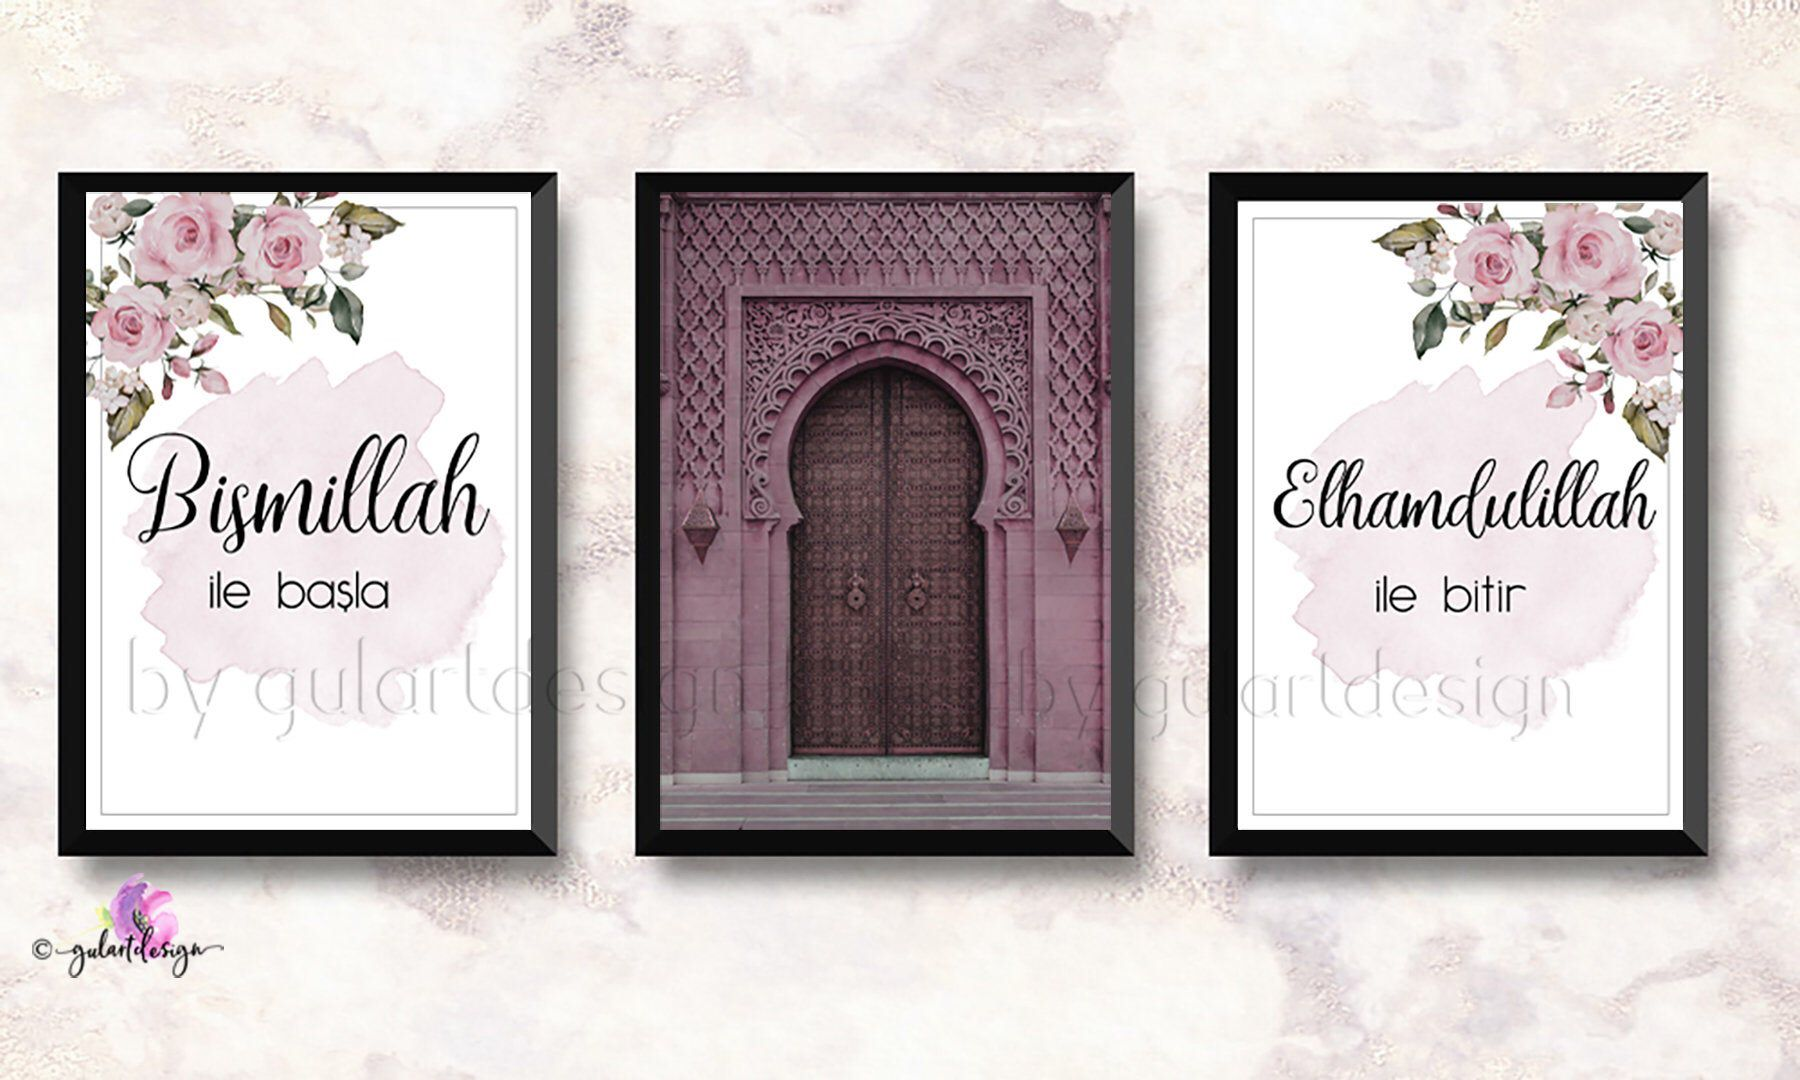 Islamische Poster Islam Islamic Islamic Wallart Islamicquotes Bismillah Inshaallah Alhamdulillah Orient Wandbilder Elhamdulillah Islamische Bilder Alhamdulillah Wandkunst Ideen